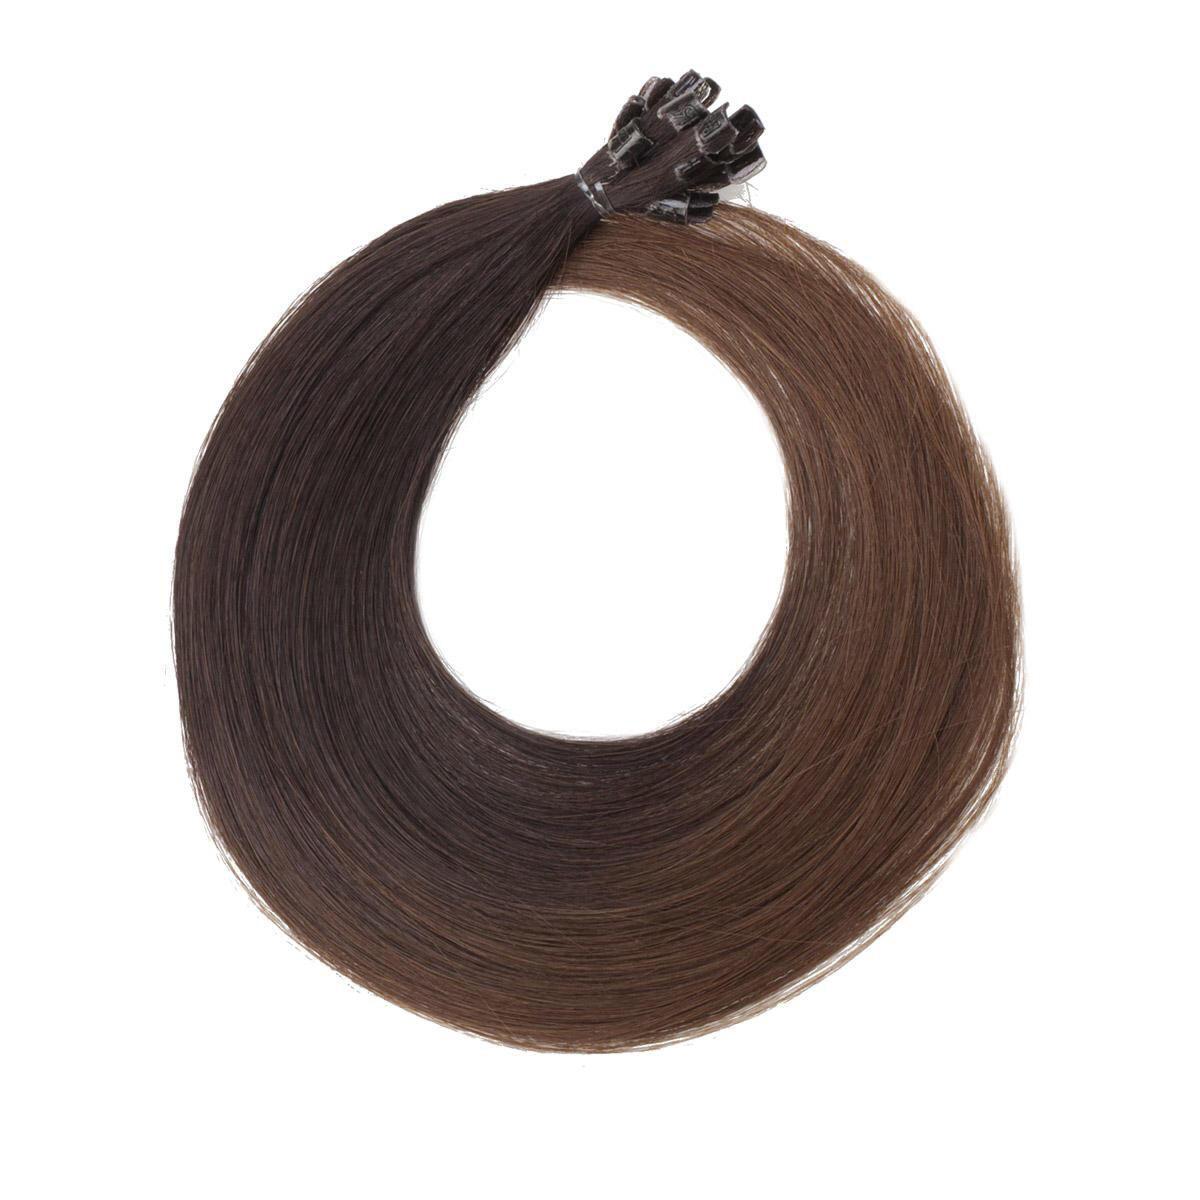 Nail Hair Original O2.3/5.0 Chocolate Brown Ombre 40 cm